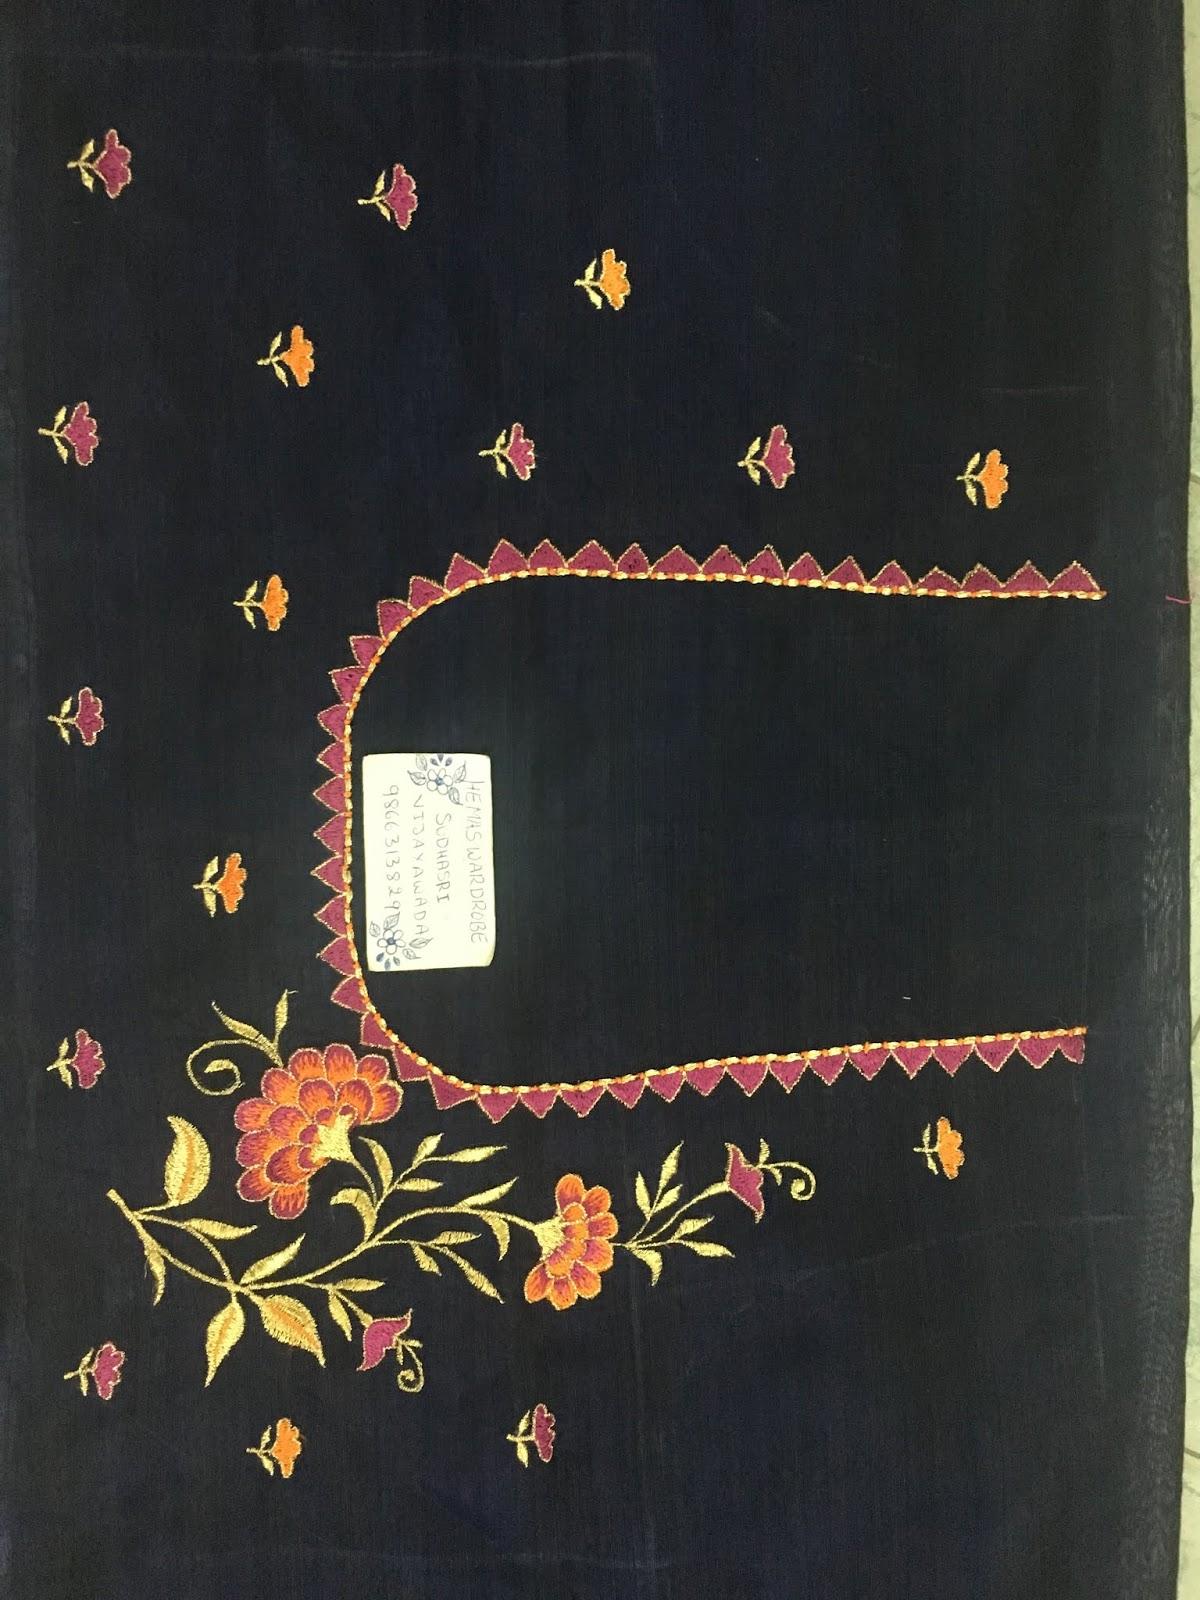 Maggam Work Blouse Designs (164)